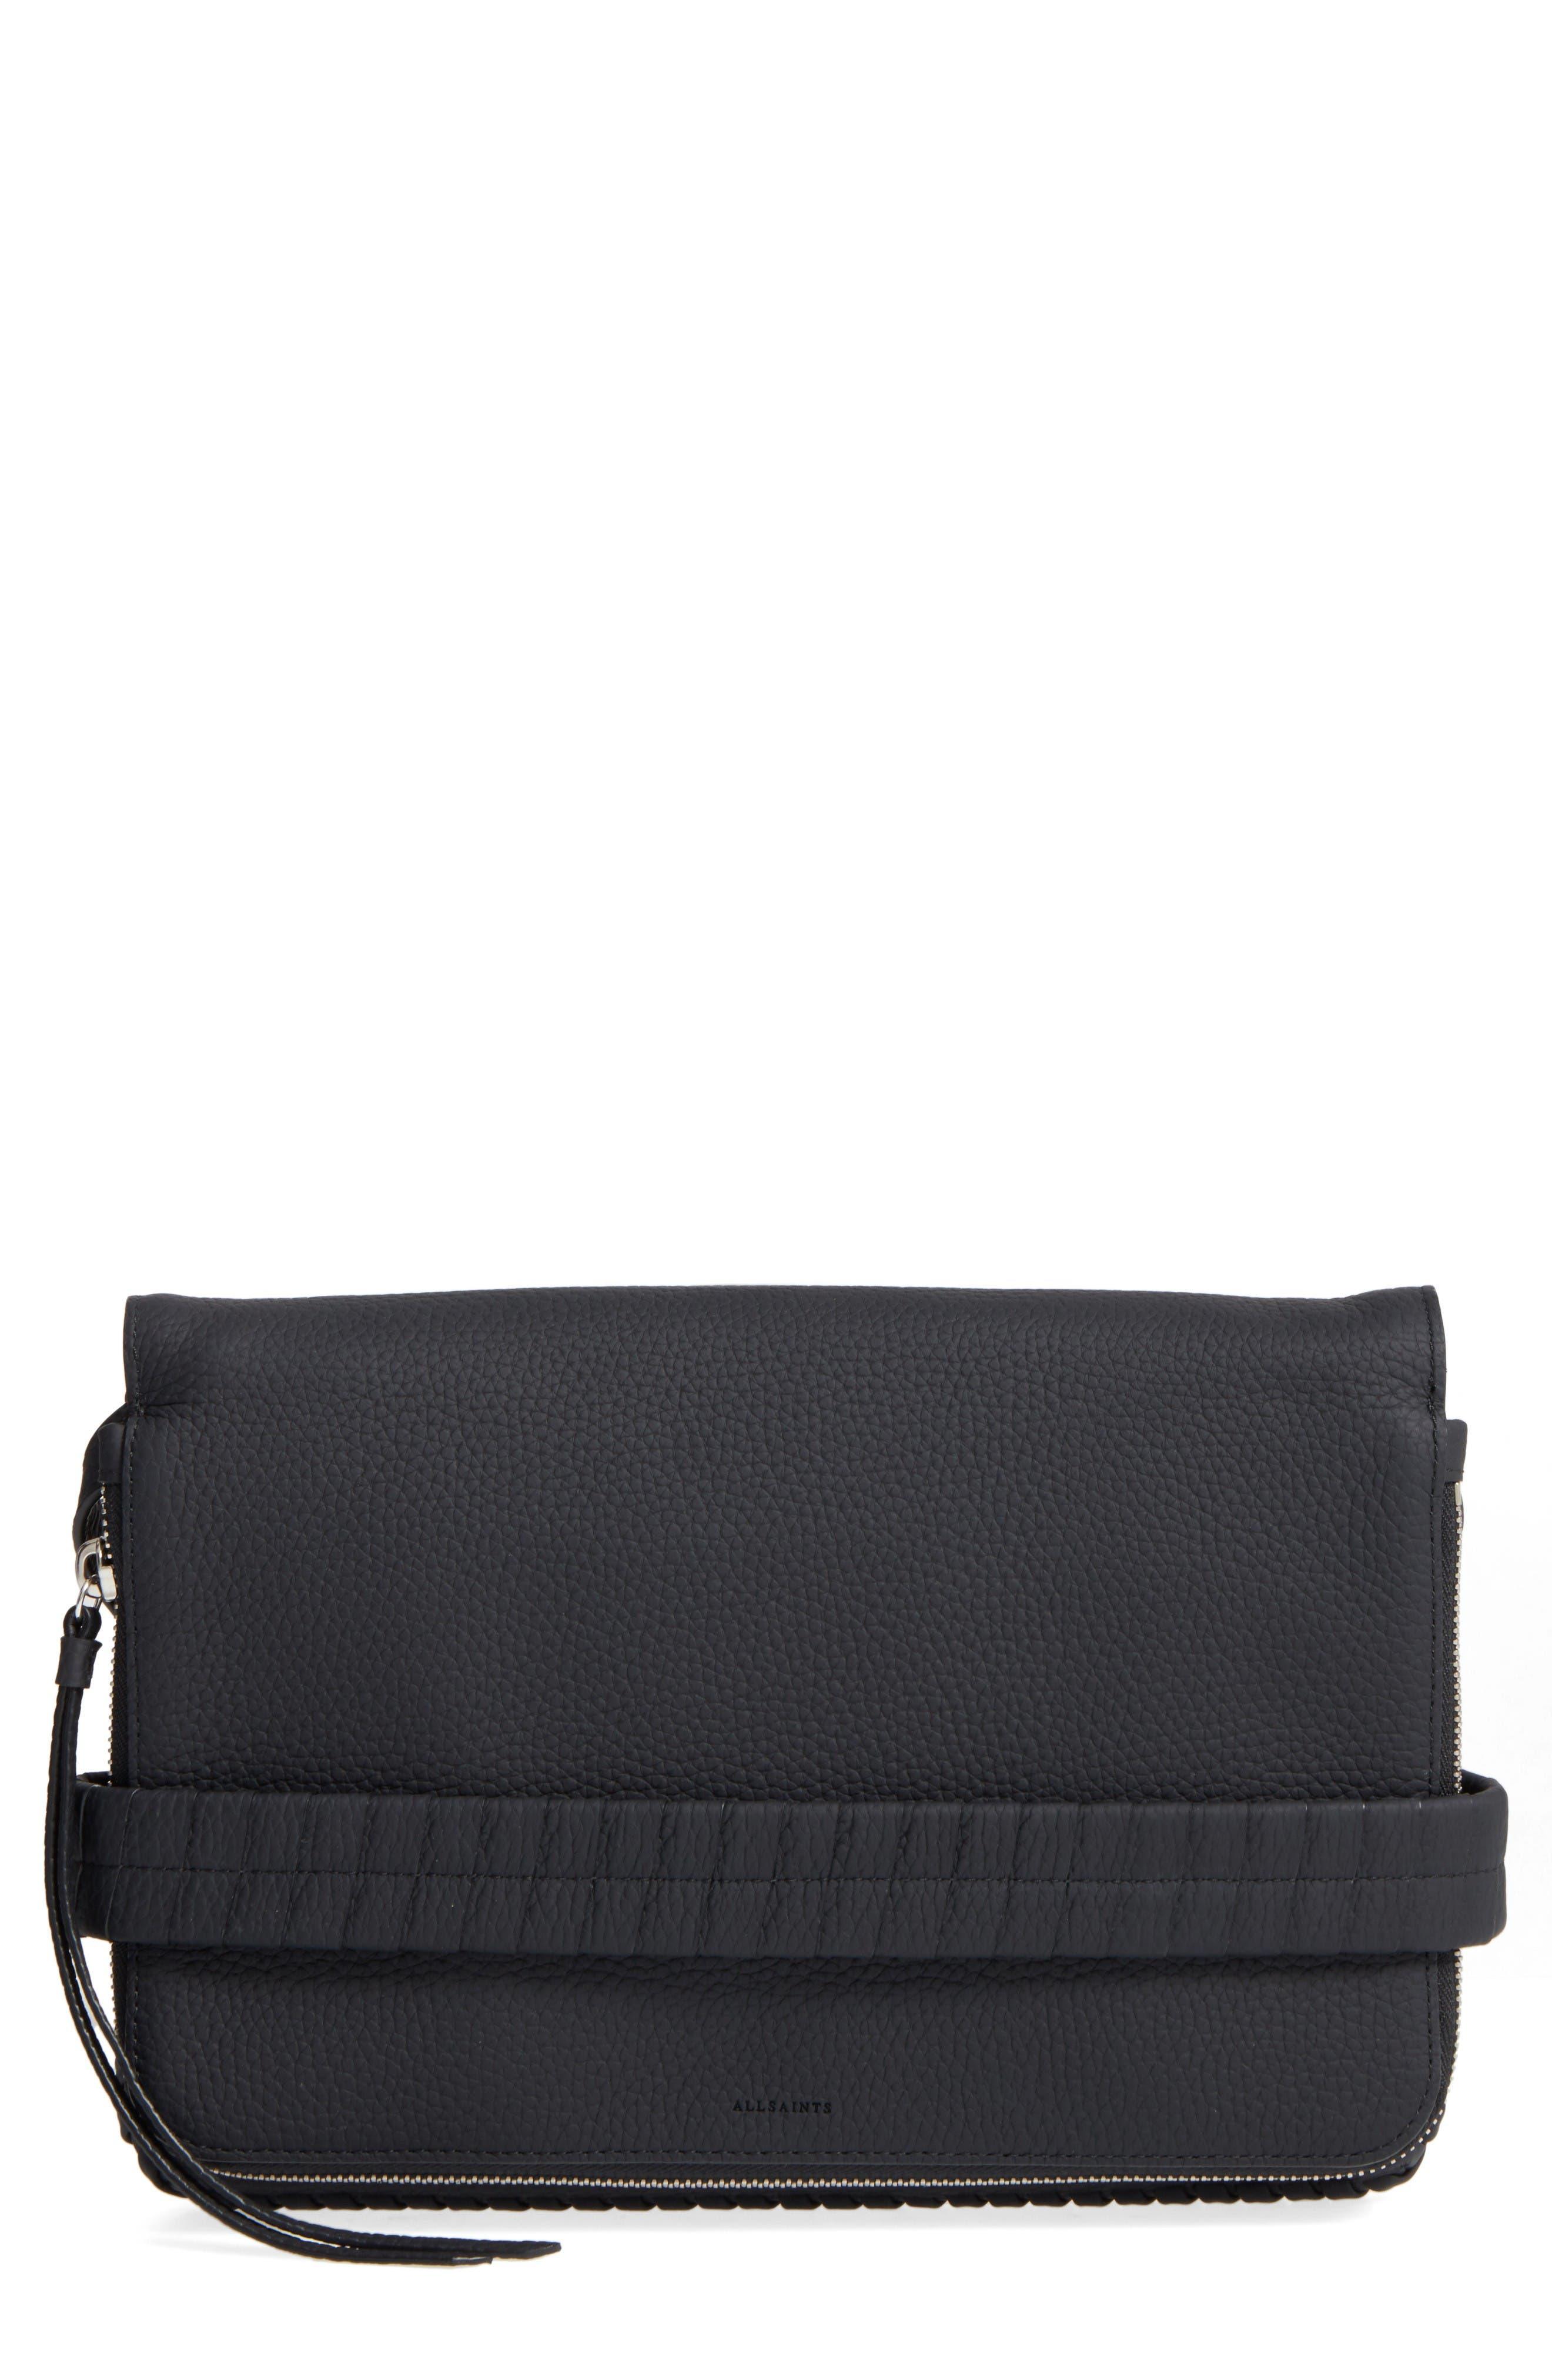 ALLSAINTS Medium Club Convertible Crossbody Bag